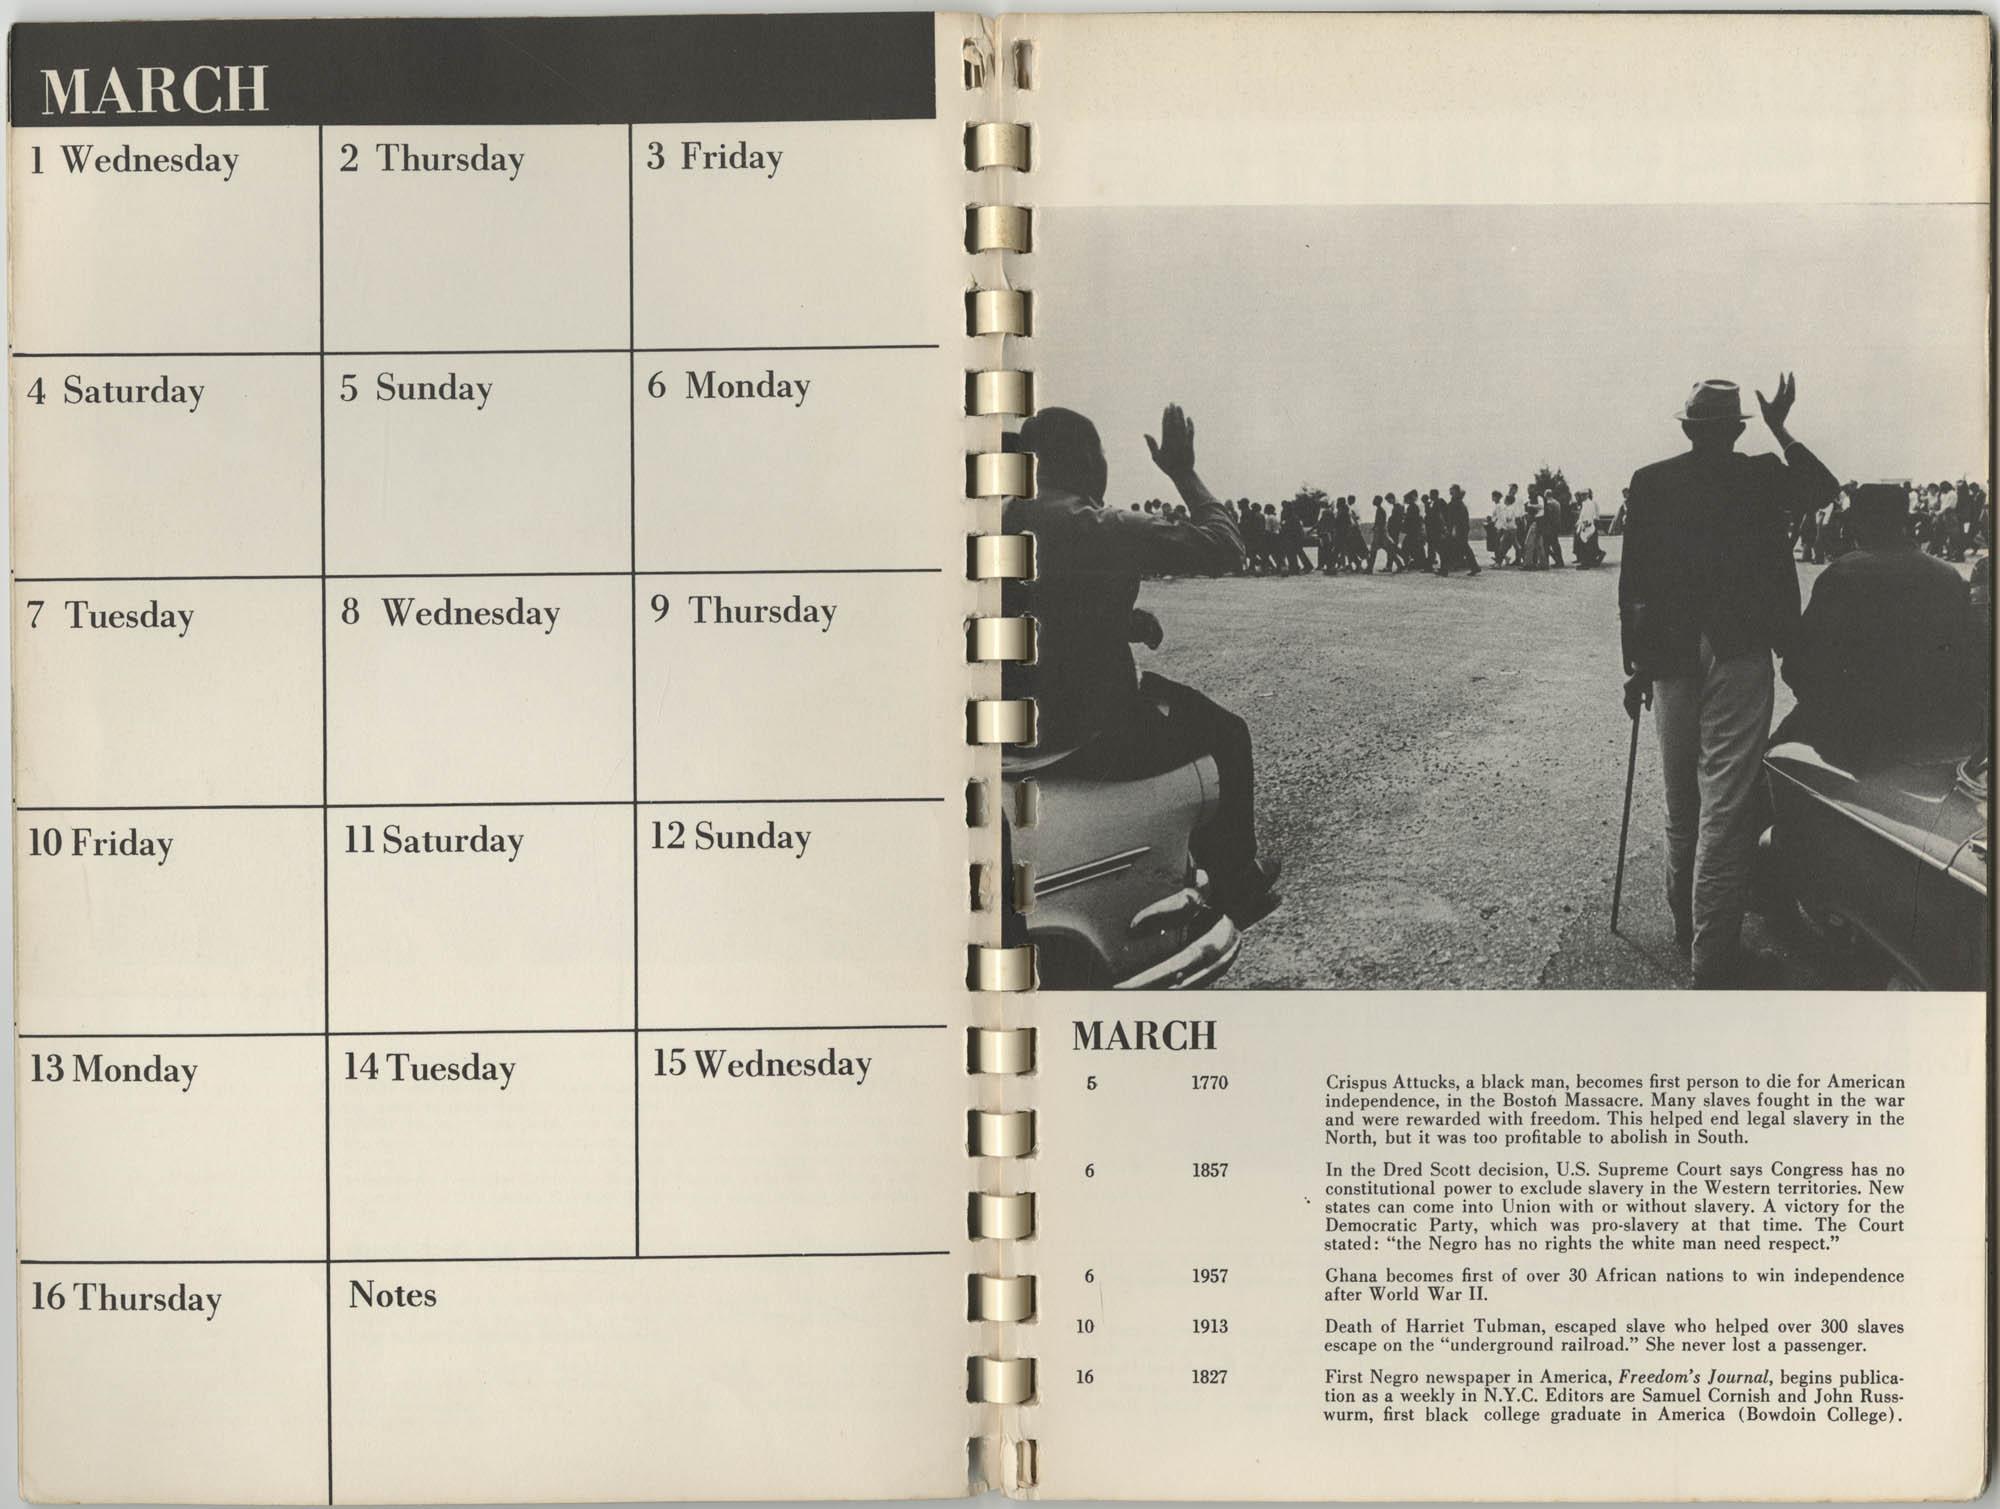 1967 SNCC Calendar, March 1-16